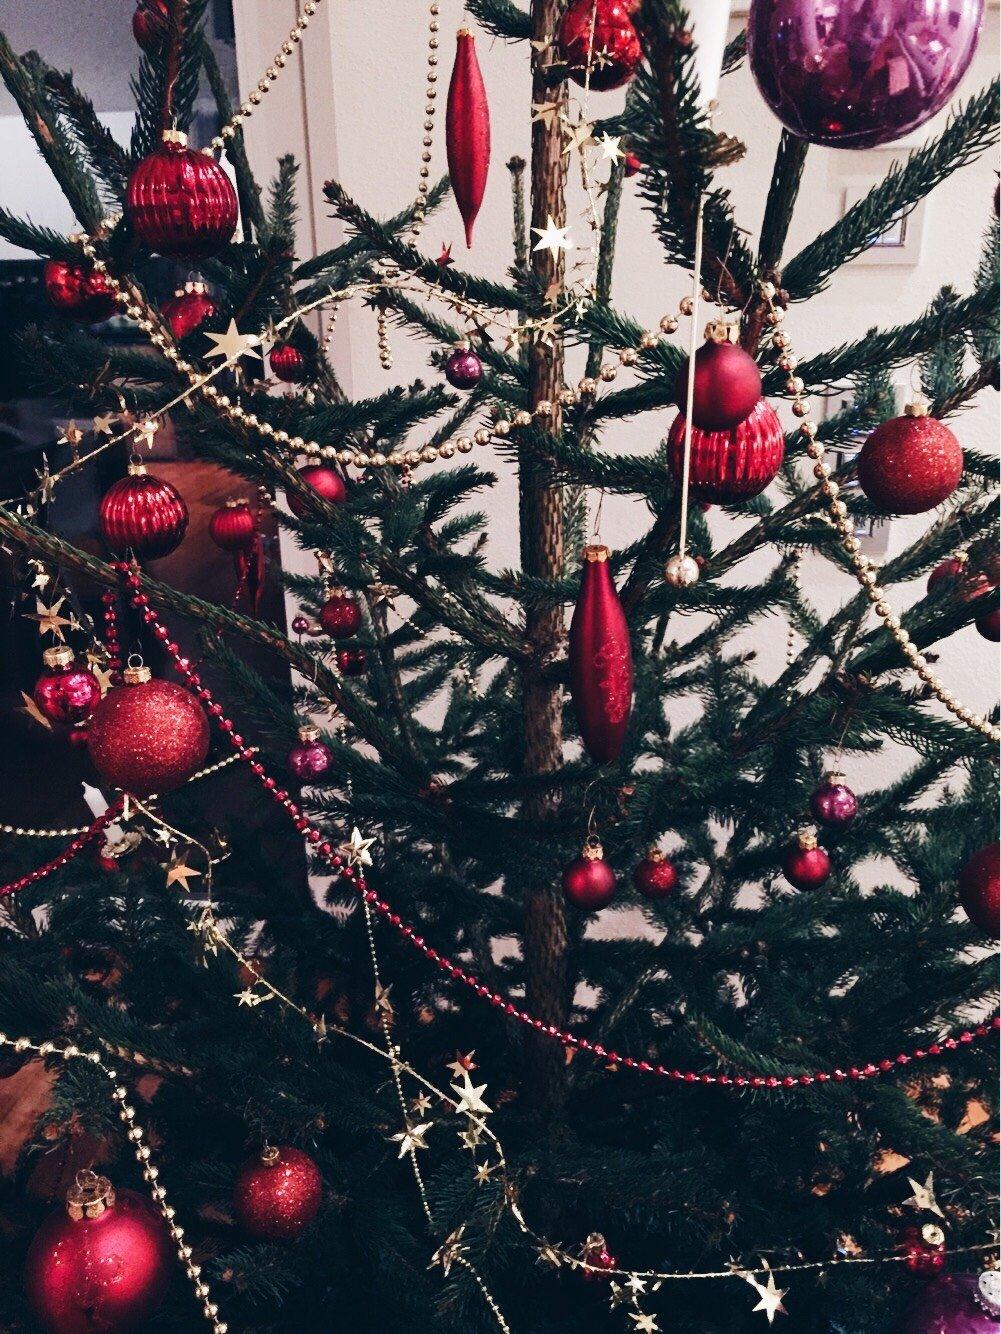 mamablog weihnachten bei uns 444